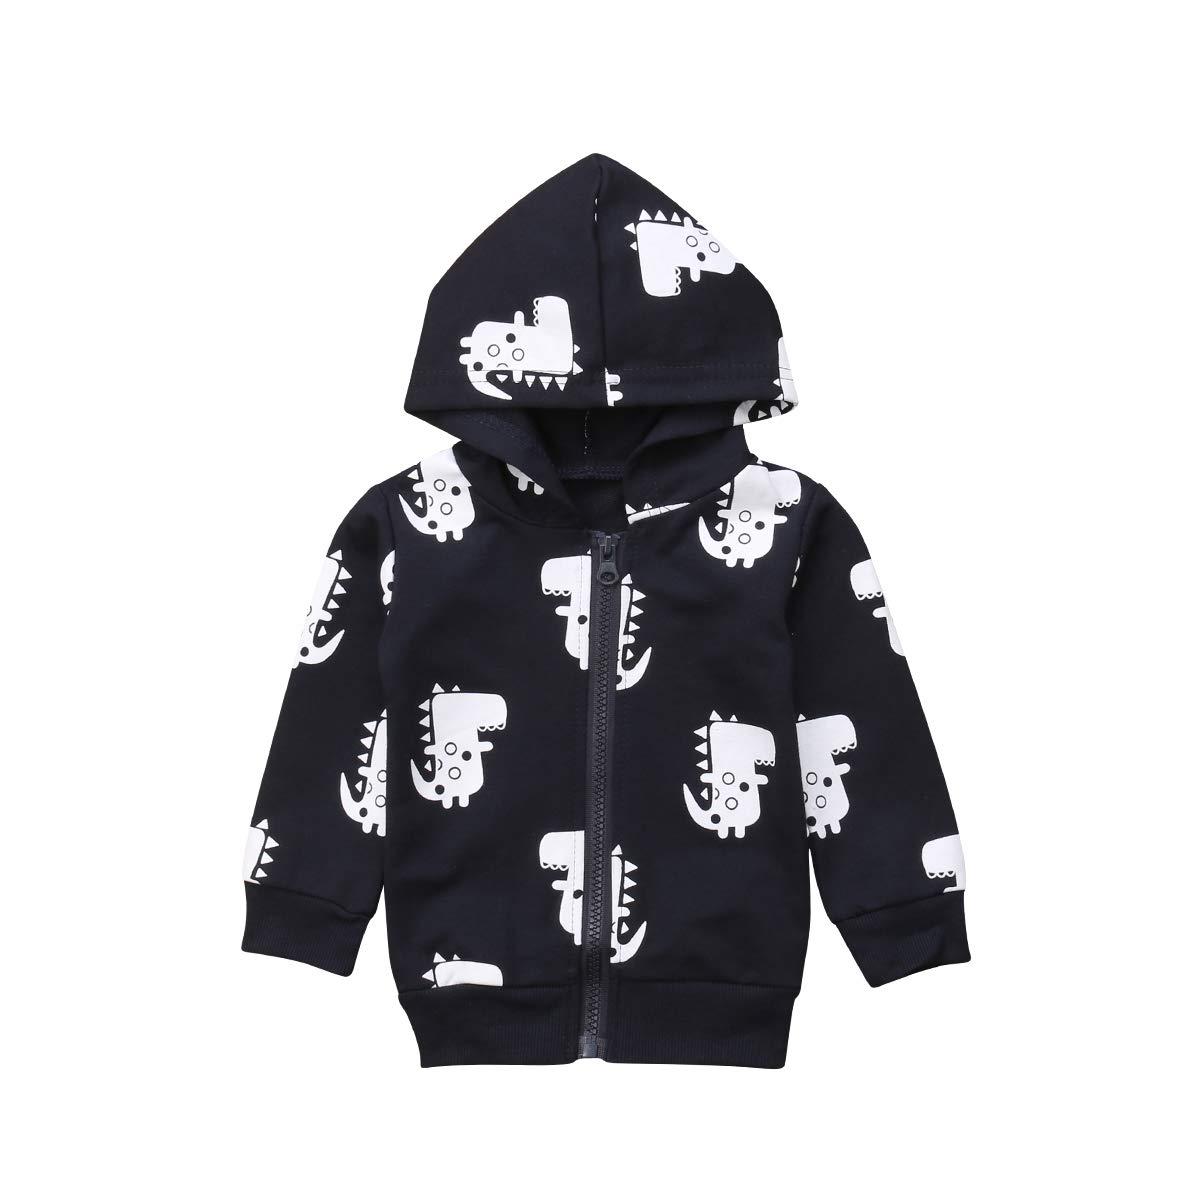 CIPOPO Unisex Boys and Girls Cute Cartoon Dinosaur Printed Tops Coat Zipper Closure Kids Hoodies Jacket Sweatshirt